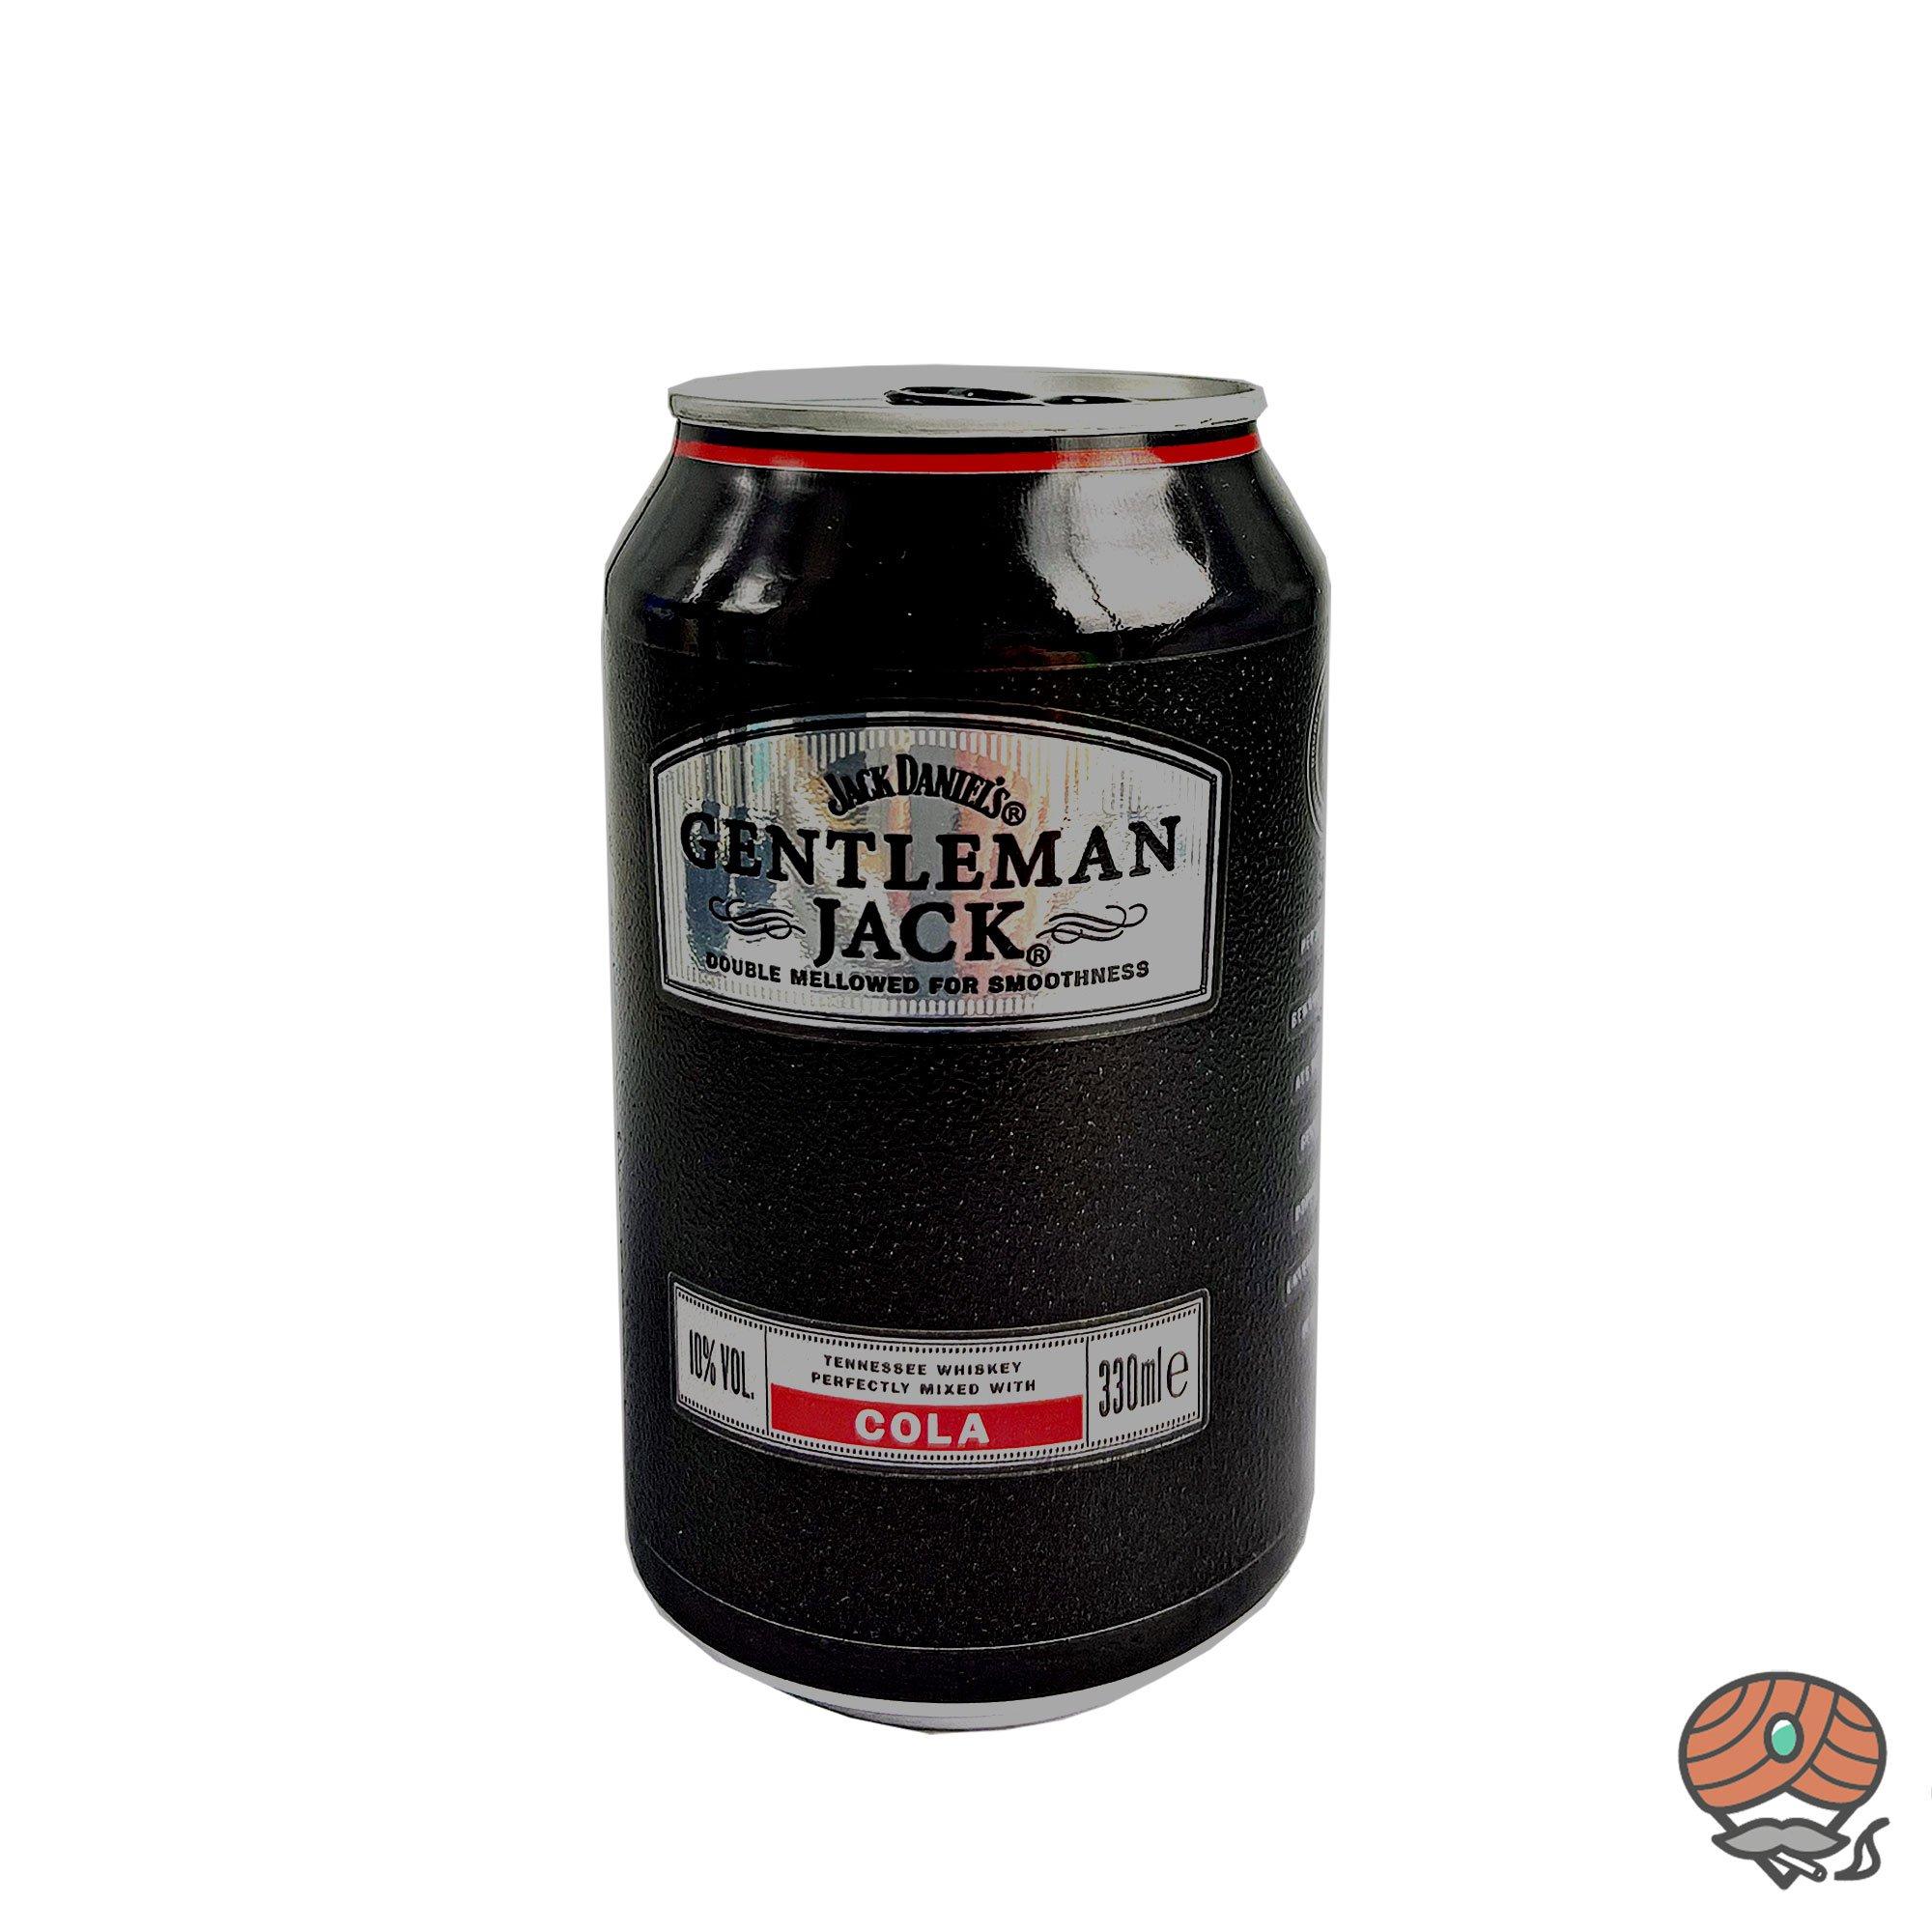 Jack Daniel´s Gentleman Jack Cola Mixgetränk 0,33 l inkl.0,25 Euro Pfand (alc. 10% Vol)